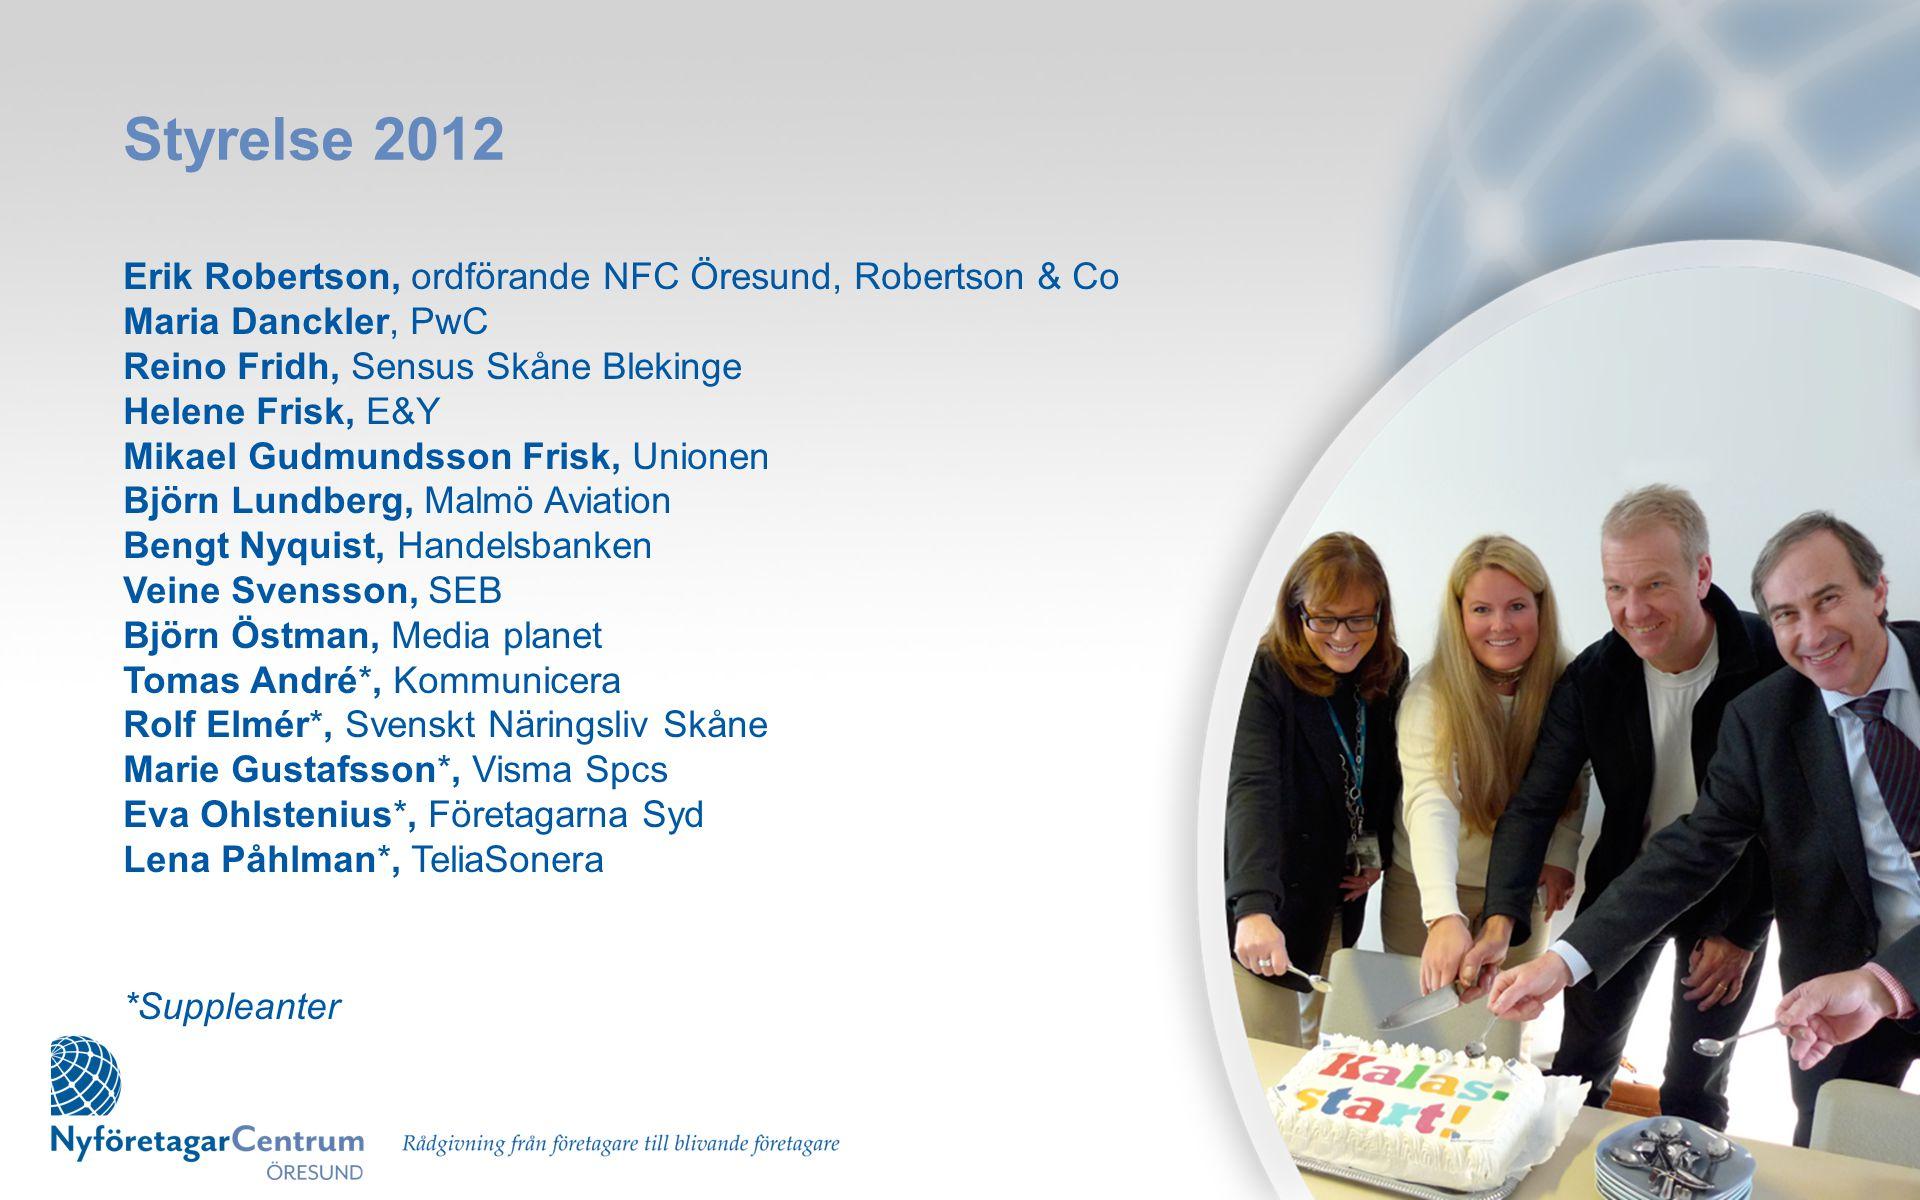 Styrelse 2012 Erik Robertson, ordförande NFC Öresund, Robertson & Co Maria Danckler, PwC Reino Fridh, Sensus Skåne Blekinge Helene Frisk, E&Y Mikael G